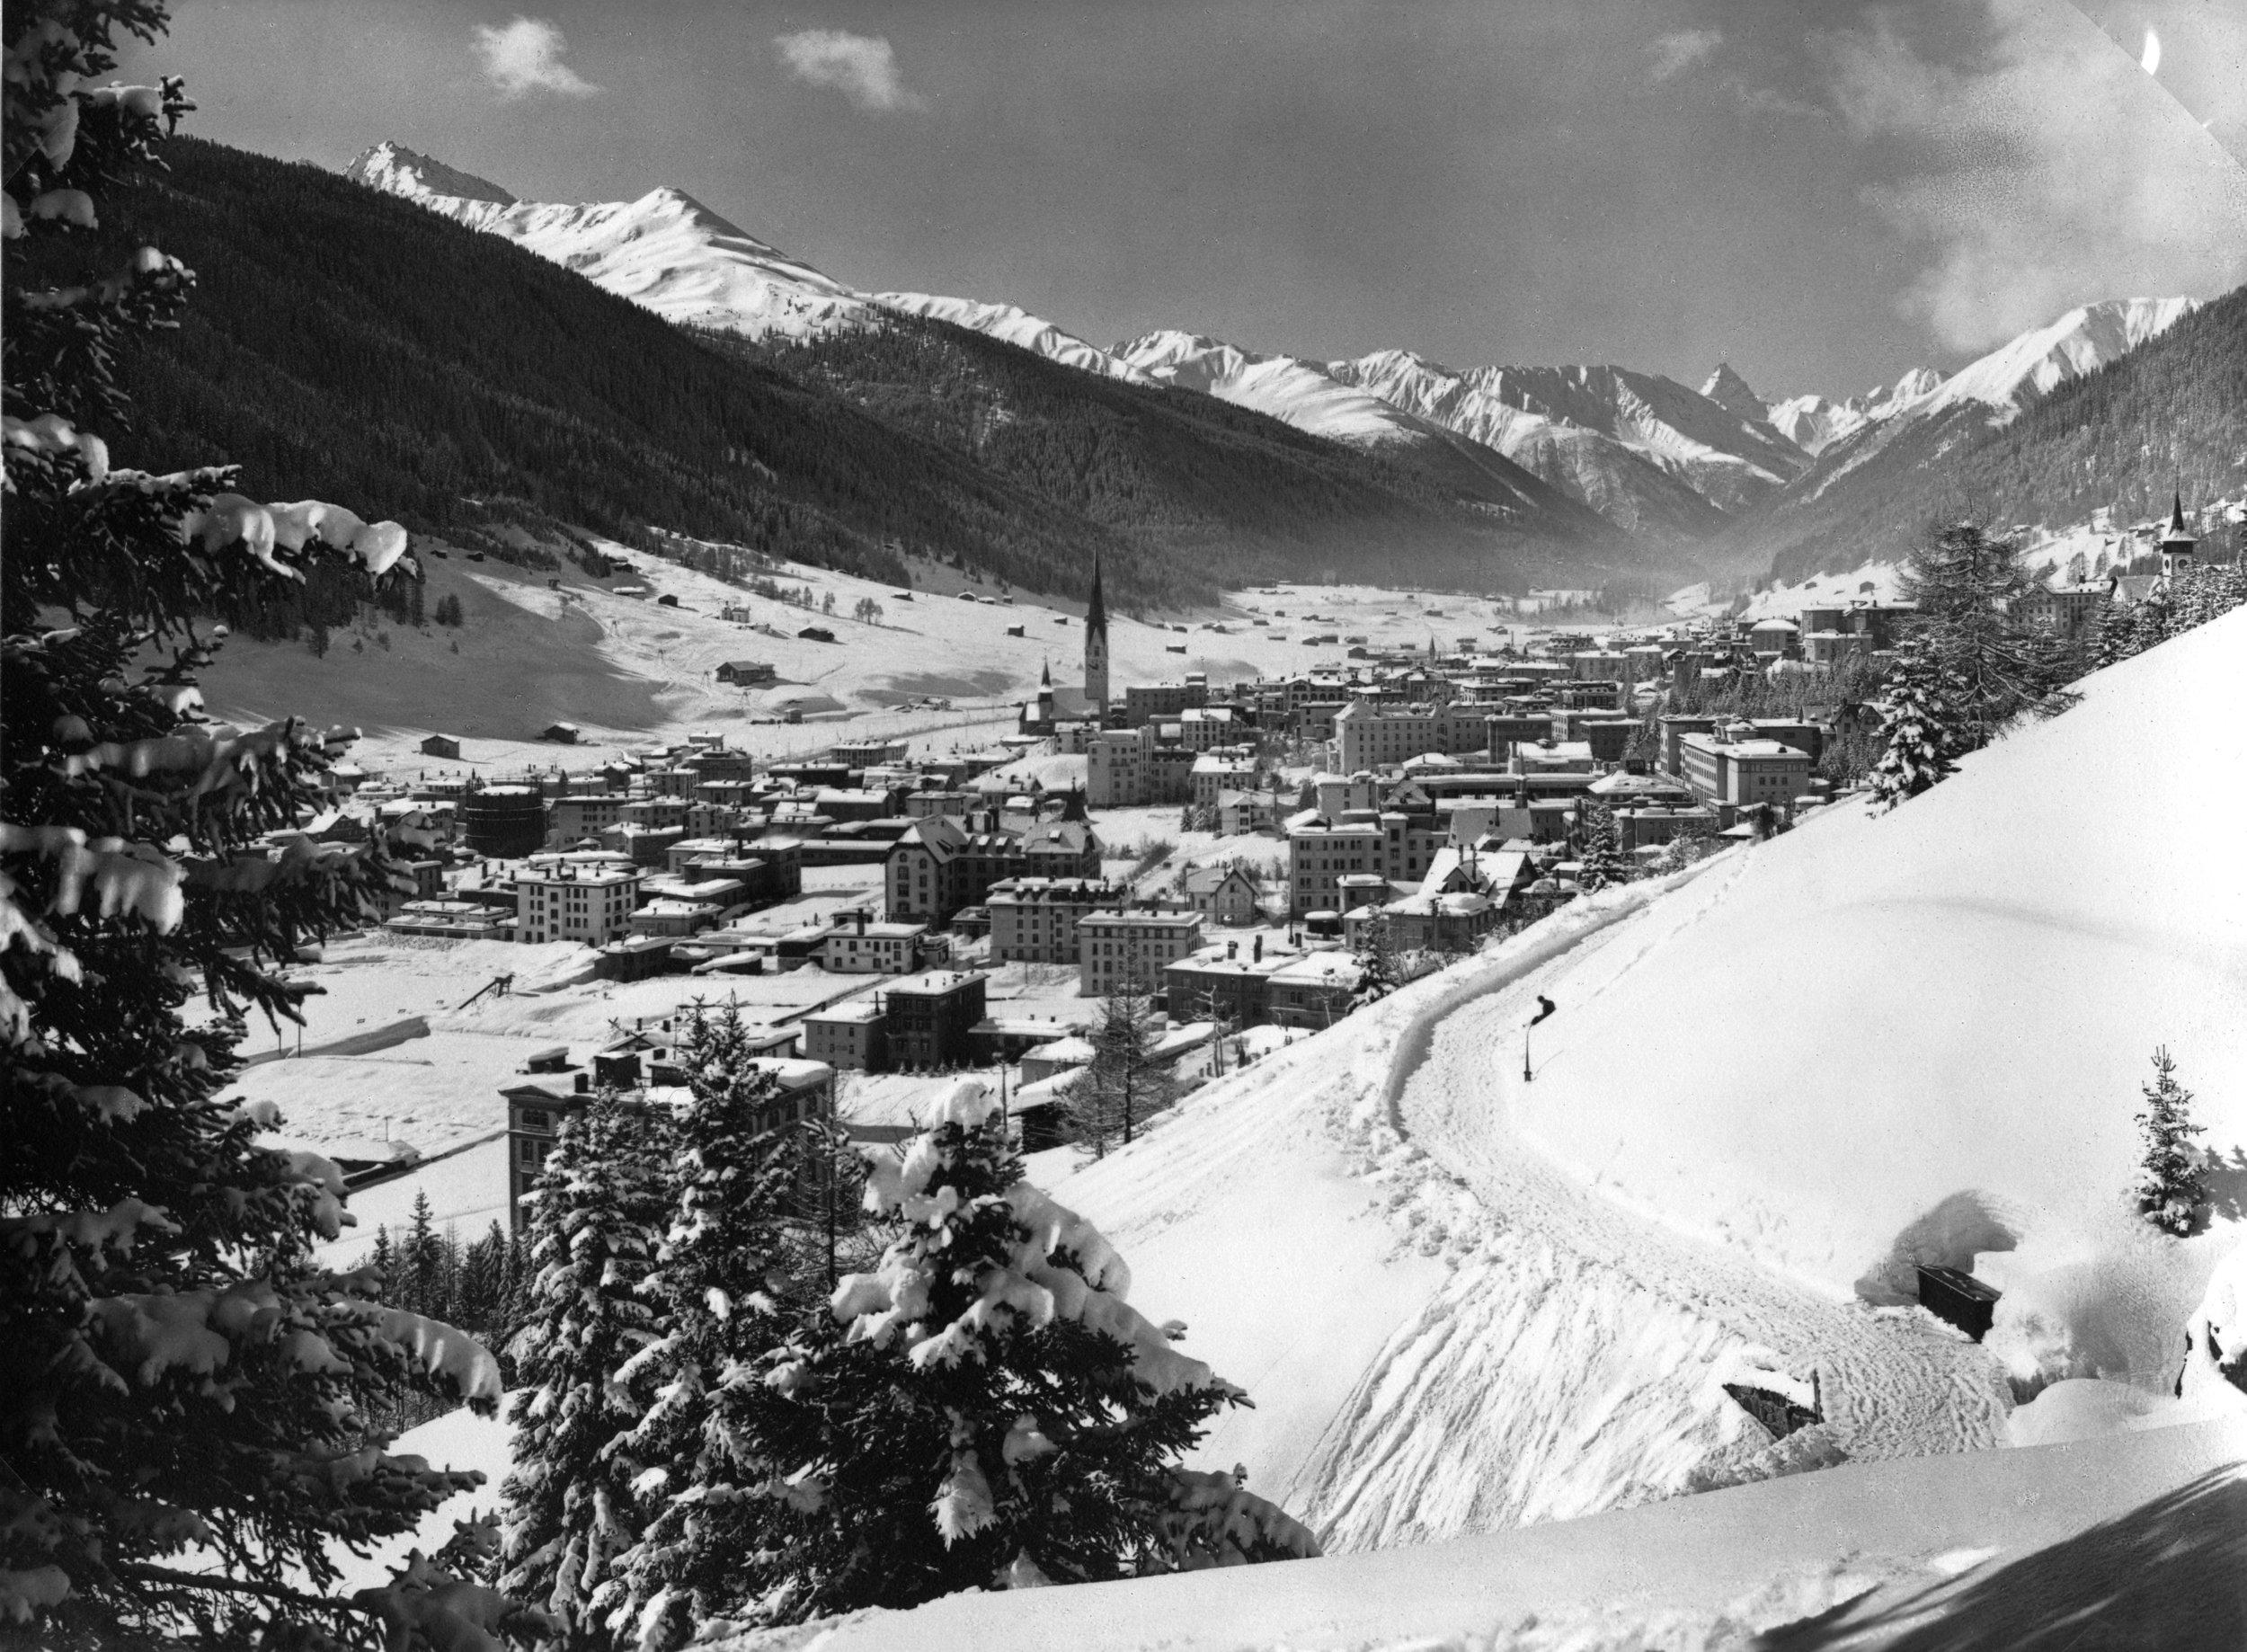 montagne.davos.jpg